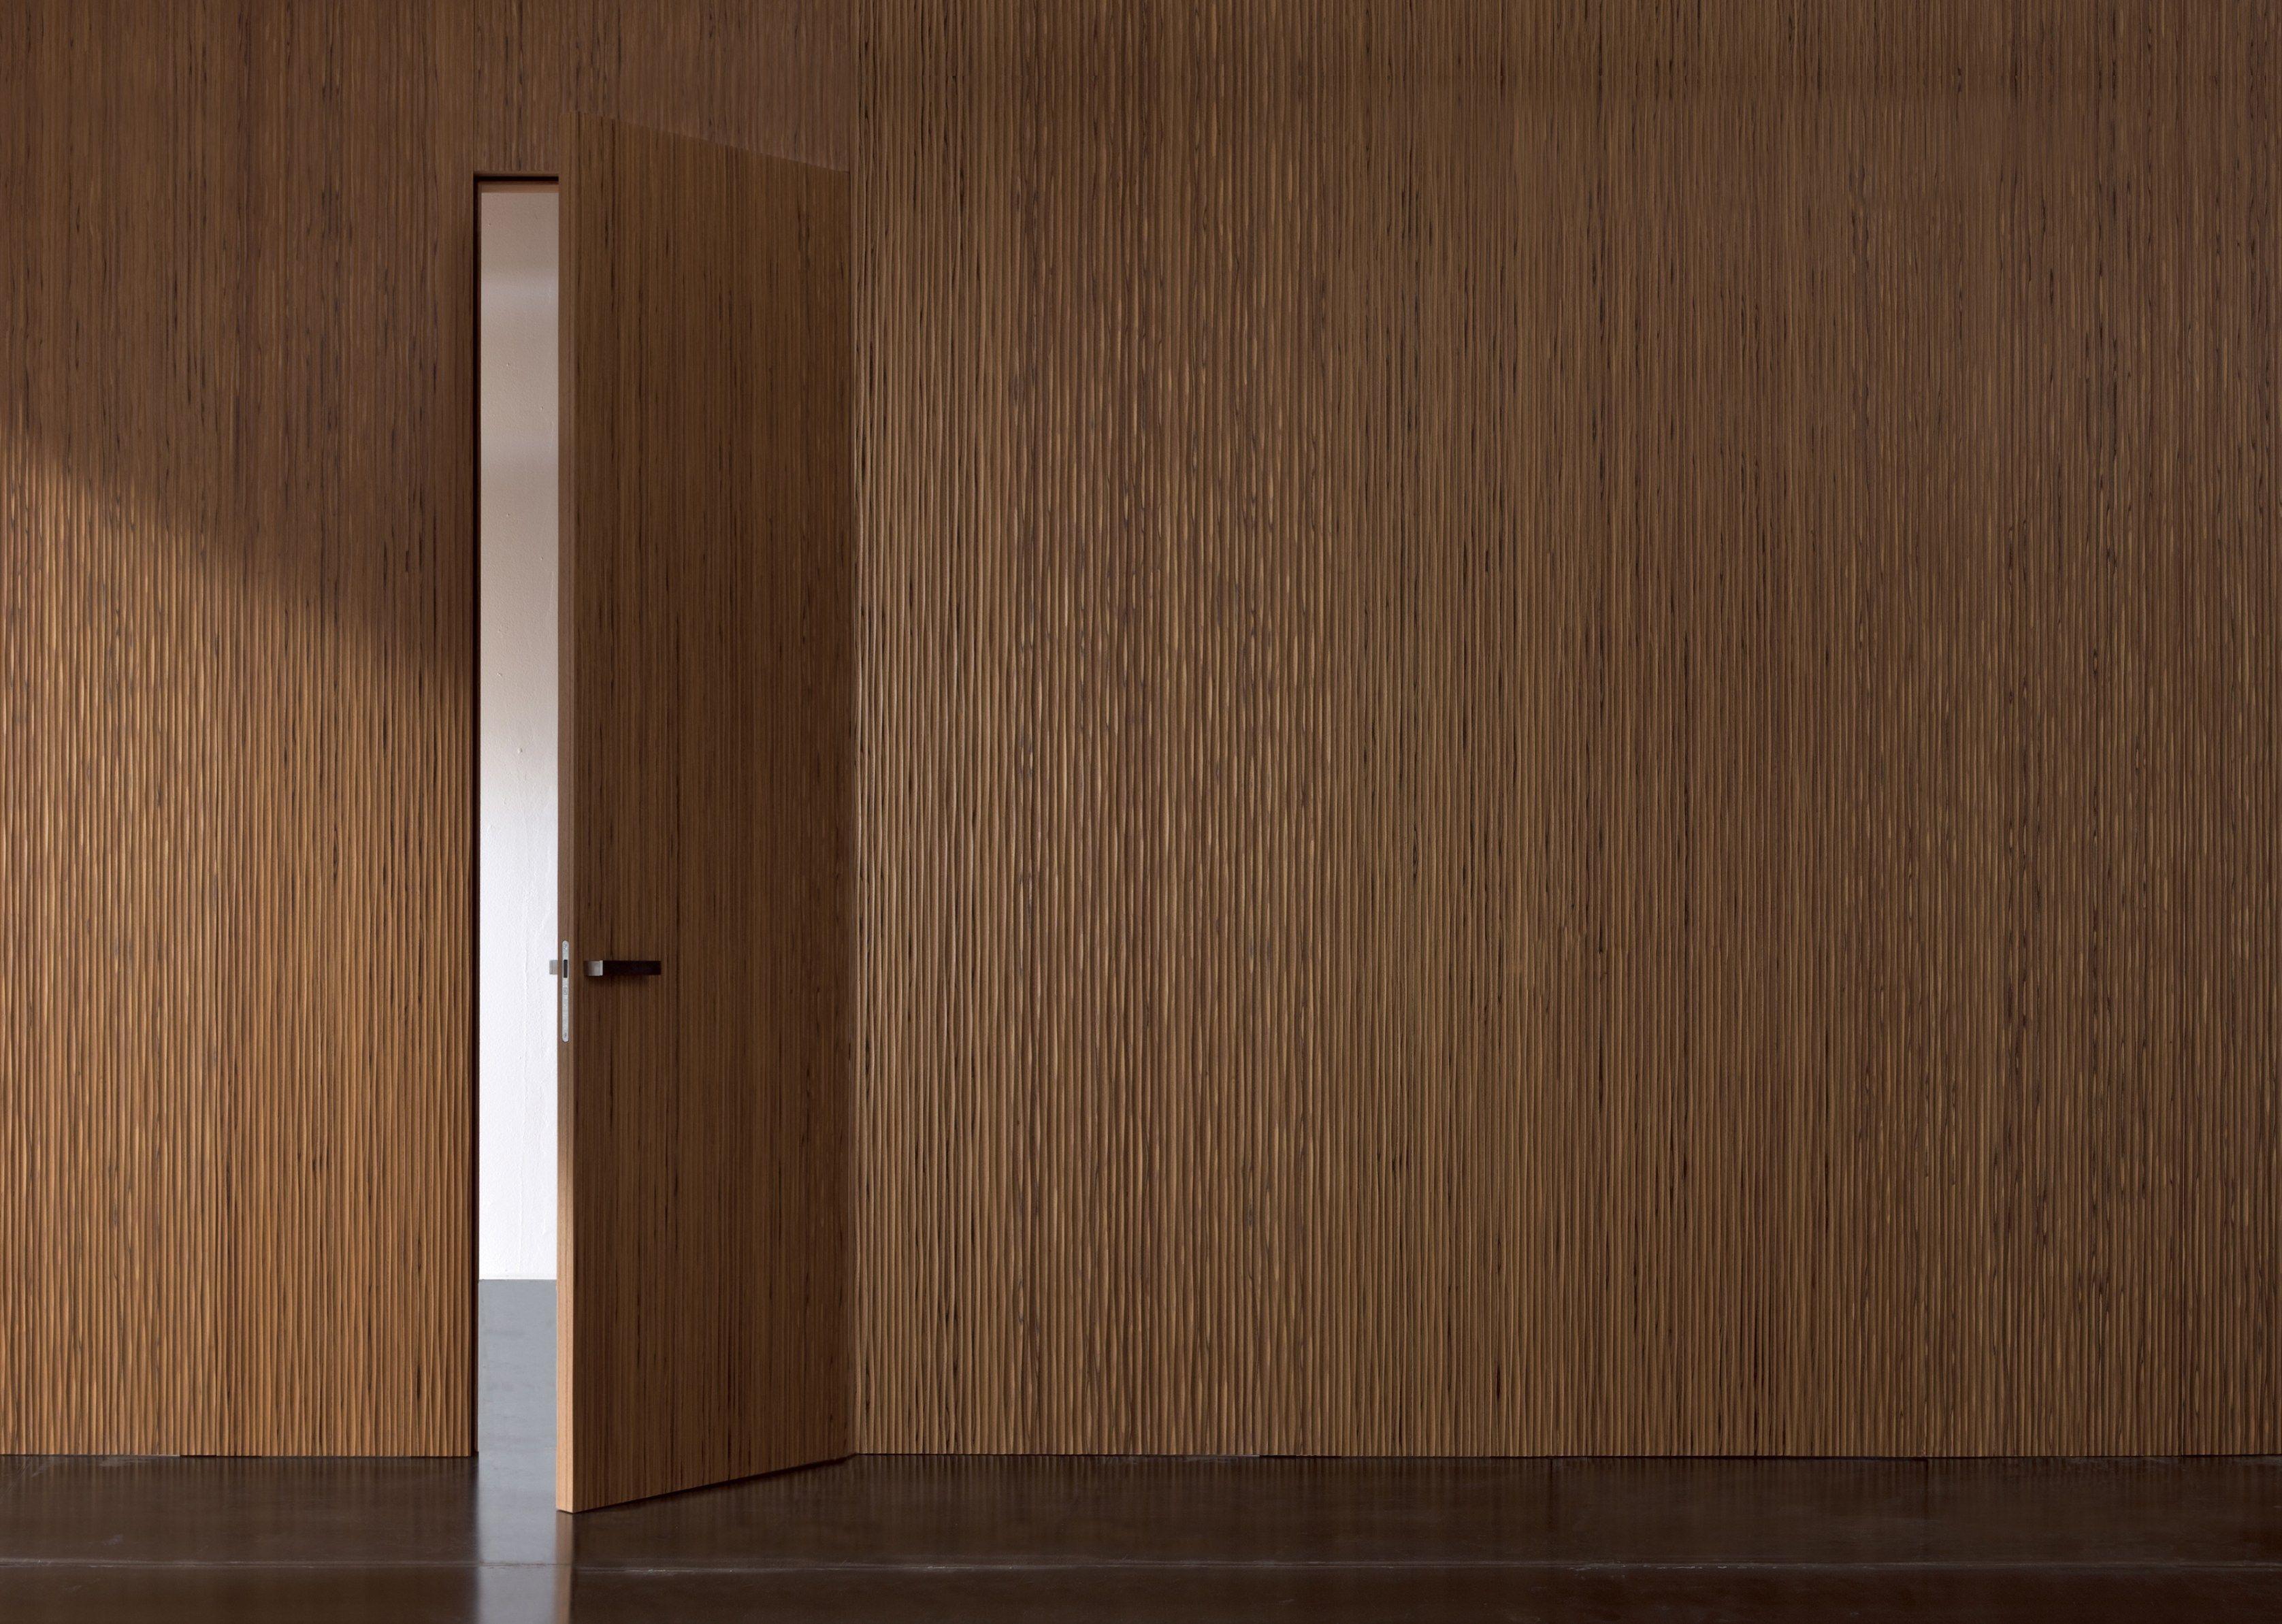 cerniere a scomparsa anta a filo : Porta a battente a filo muro con cerniere a scomparsa RL07 Porta a ...